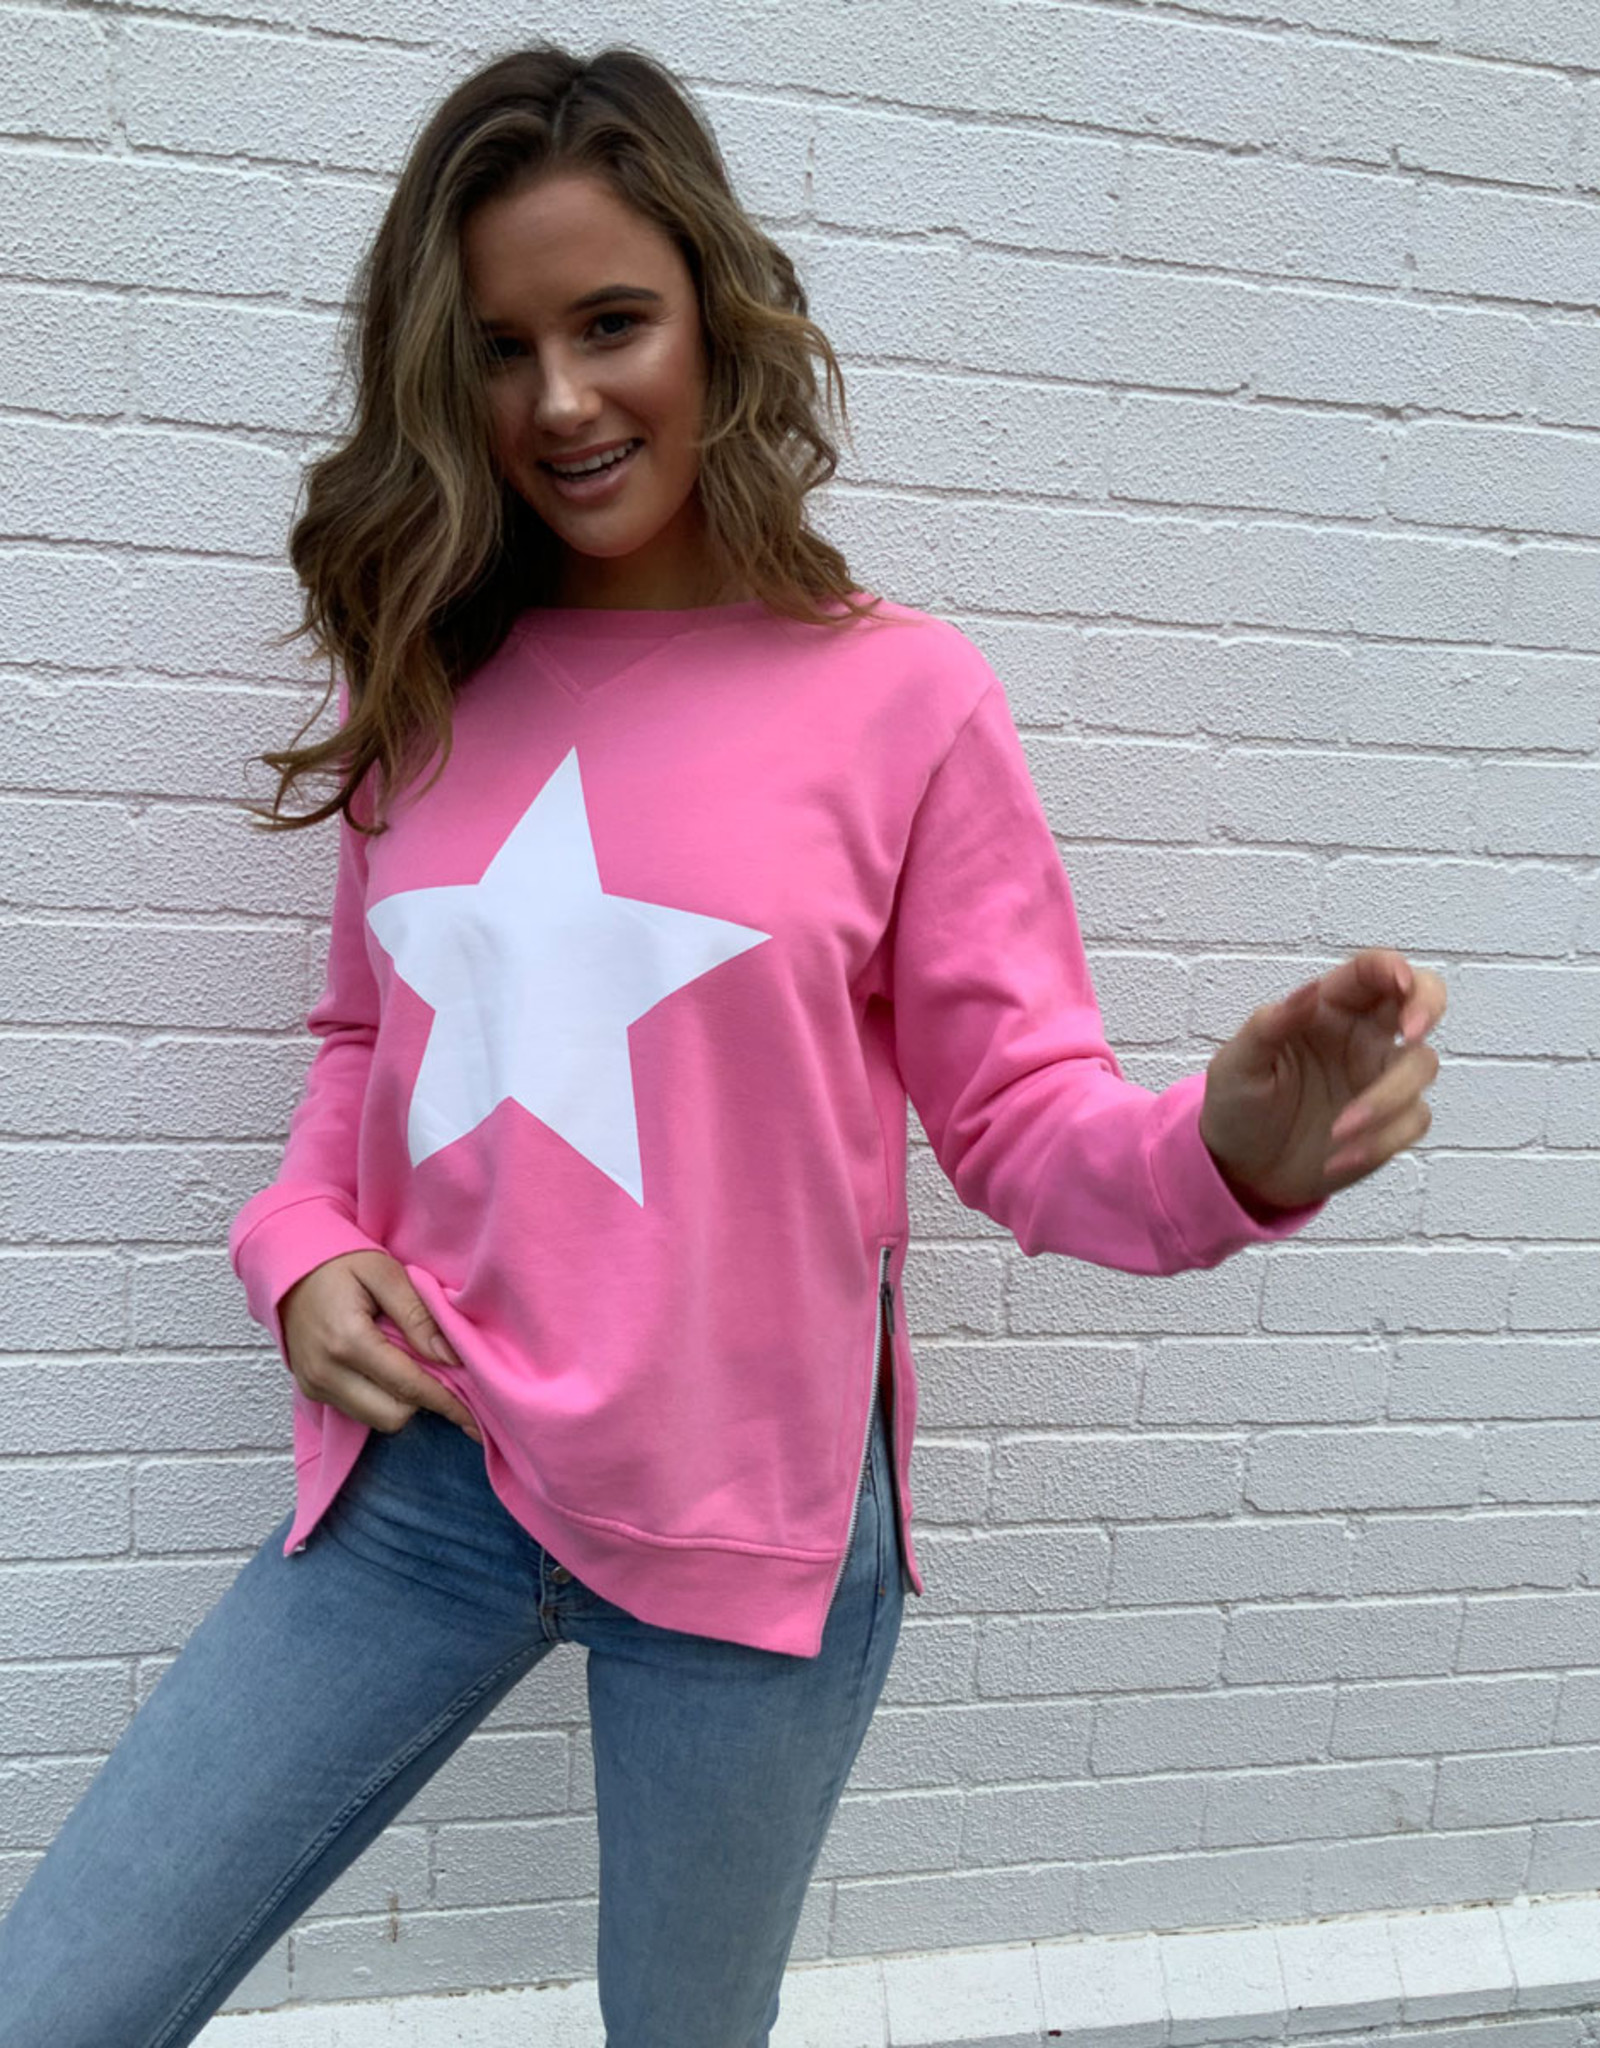 SOPHIE MORAN ZIP STAR SWEATSHIRT WINTER PINK & WHITE